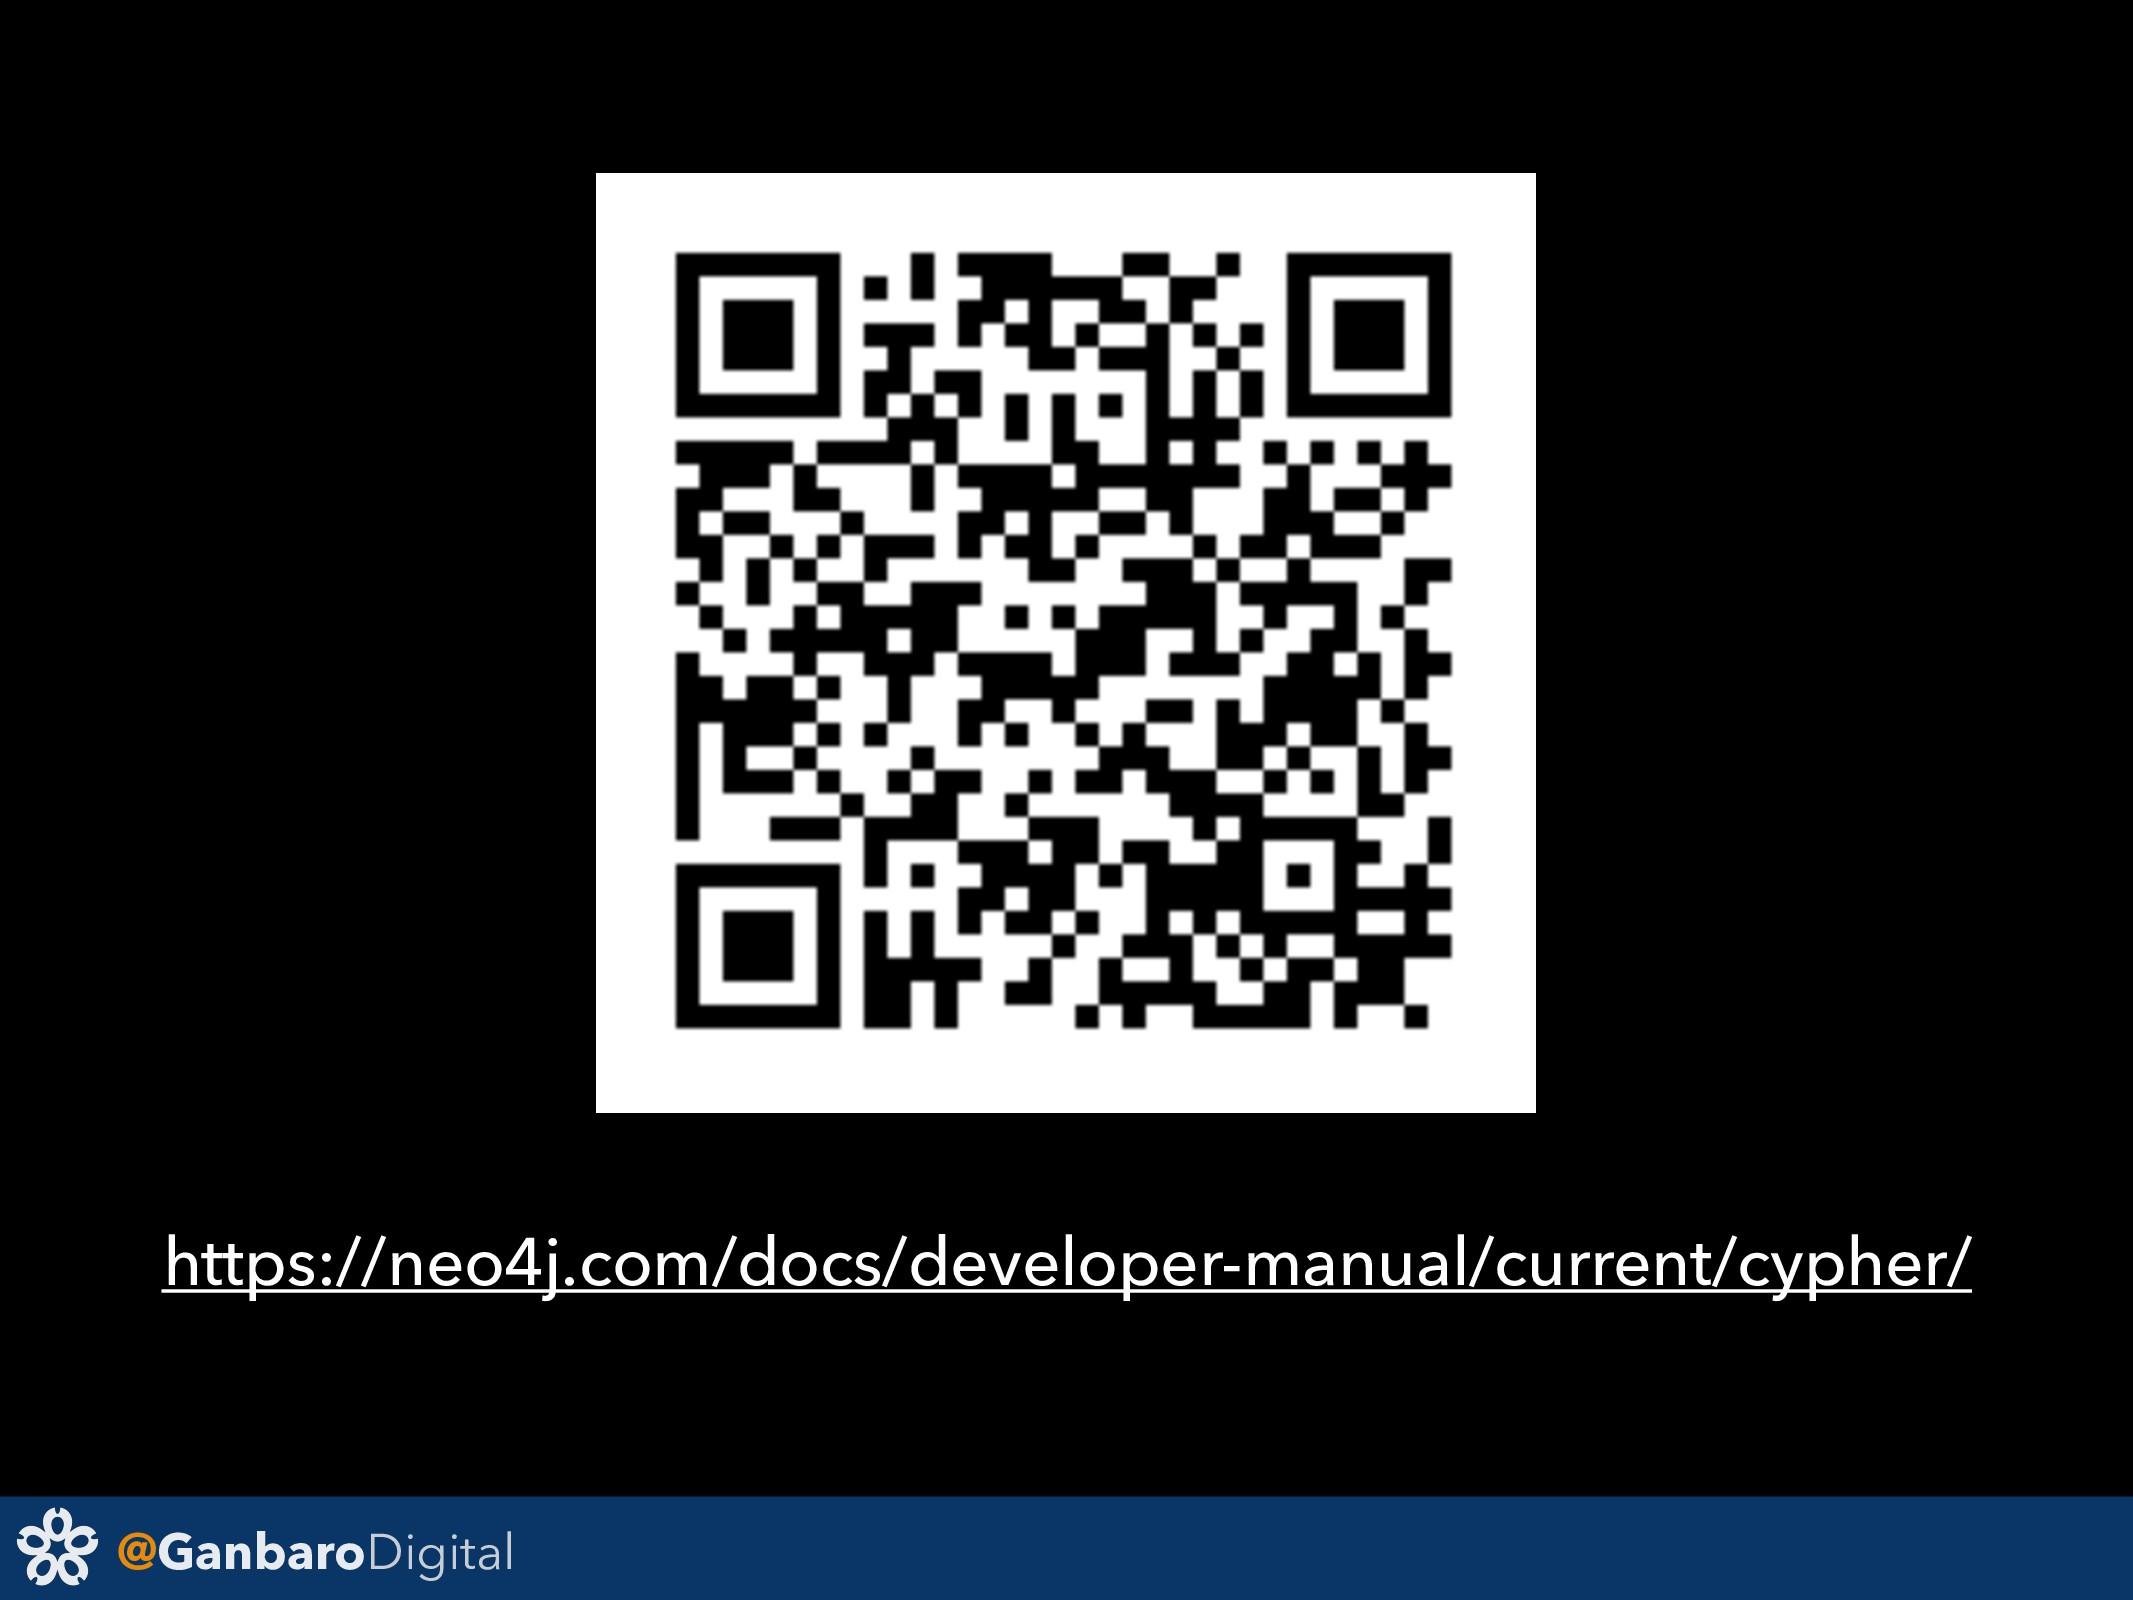 @GanbaroDigital https://neo4j.com/docs/develope...